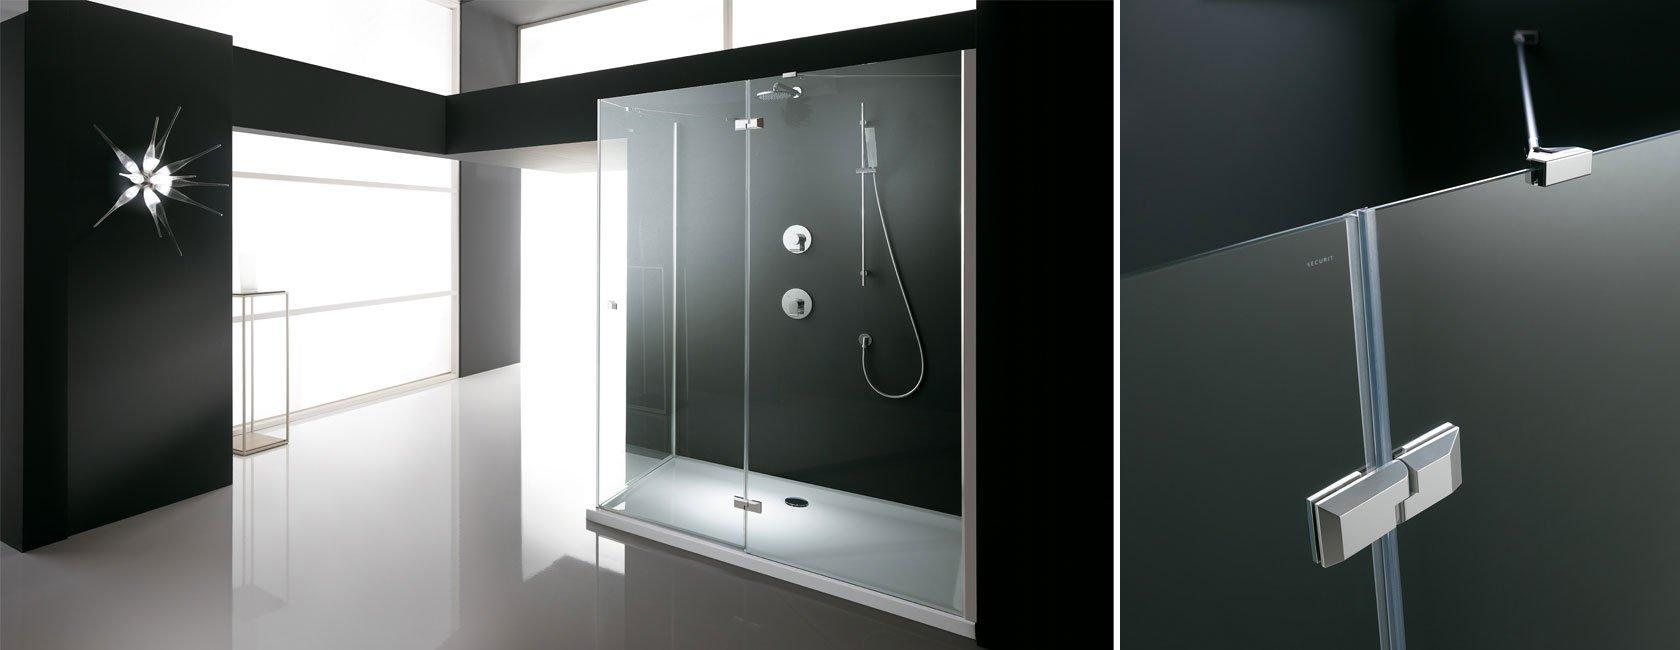 Cheap vasca da bagno con doccia with vasca da bagno con doccia - Rinnovare vasca da bagno ...